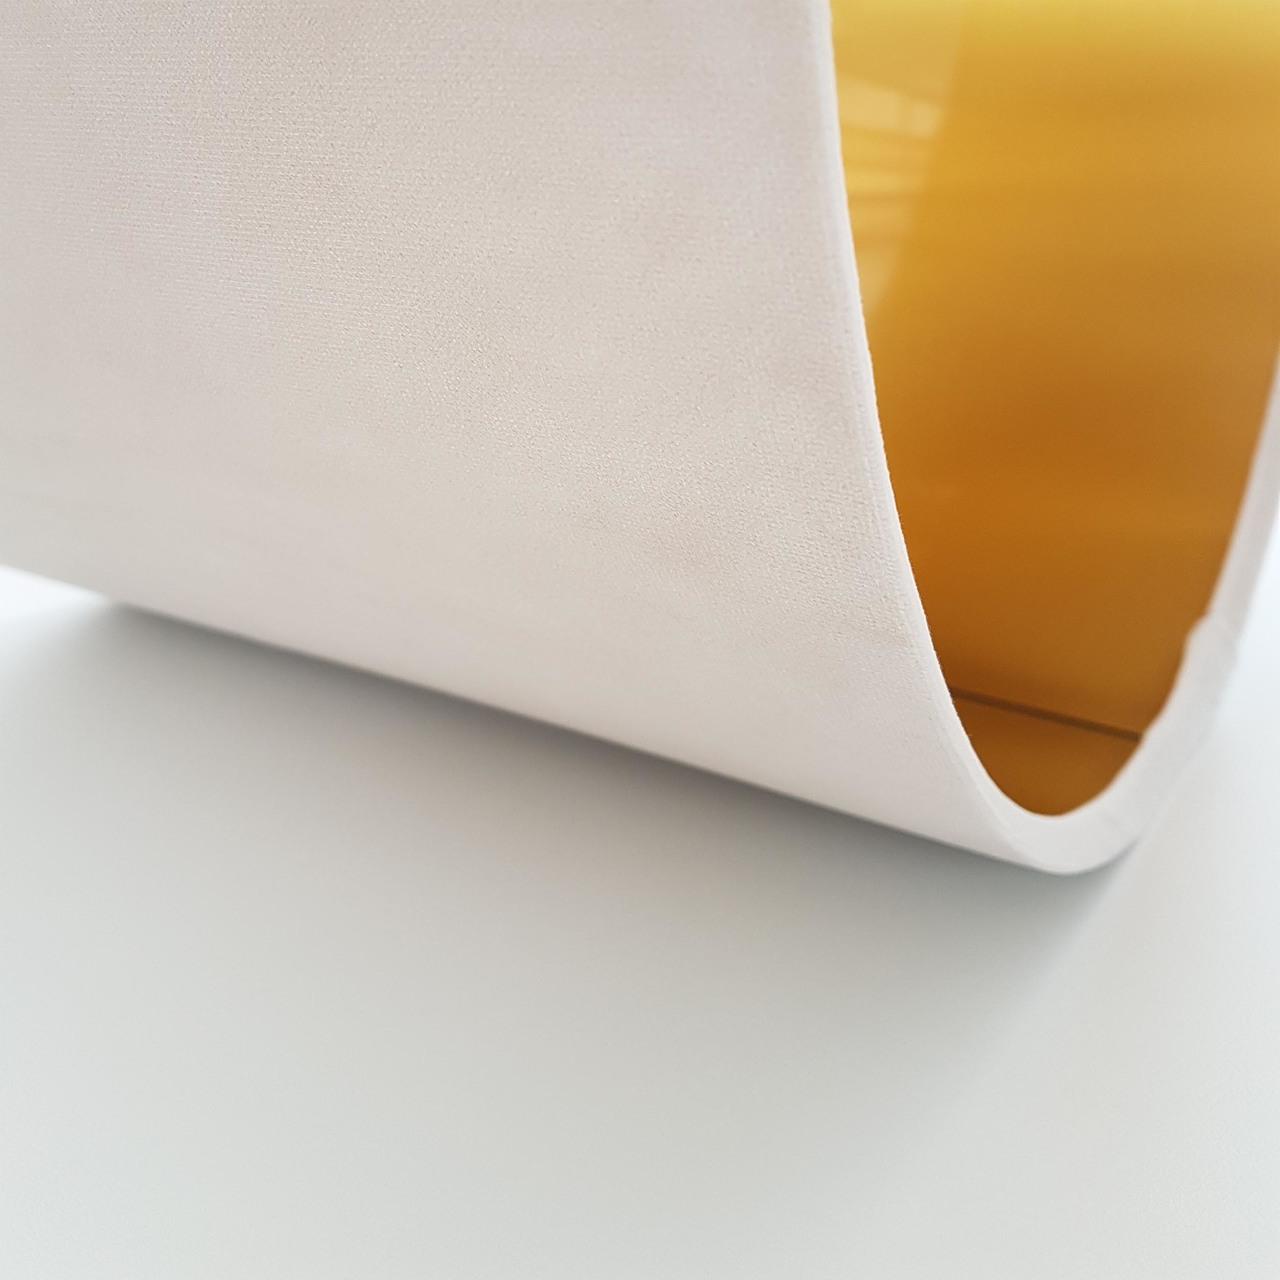 Cream Velvet and Metallic Gold Lampshade